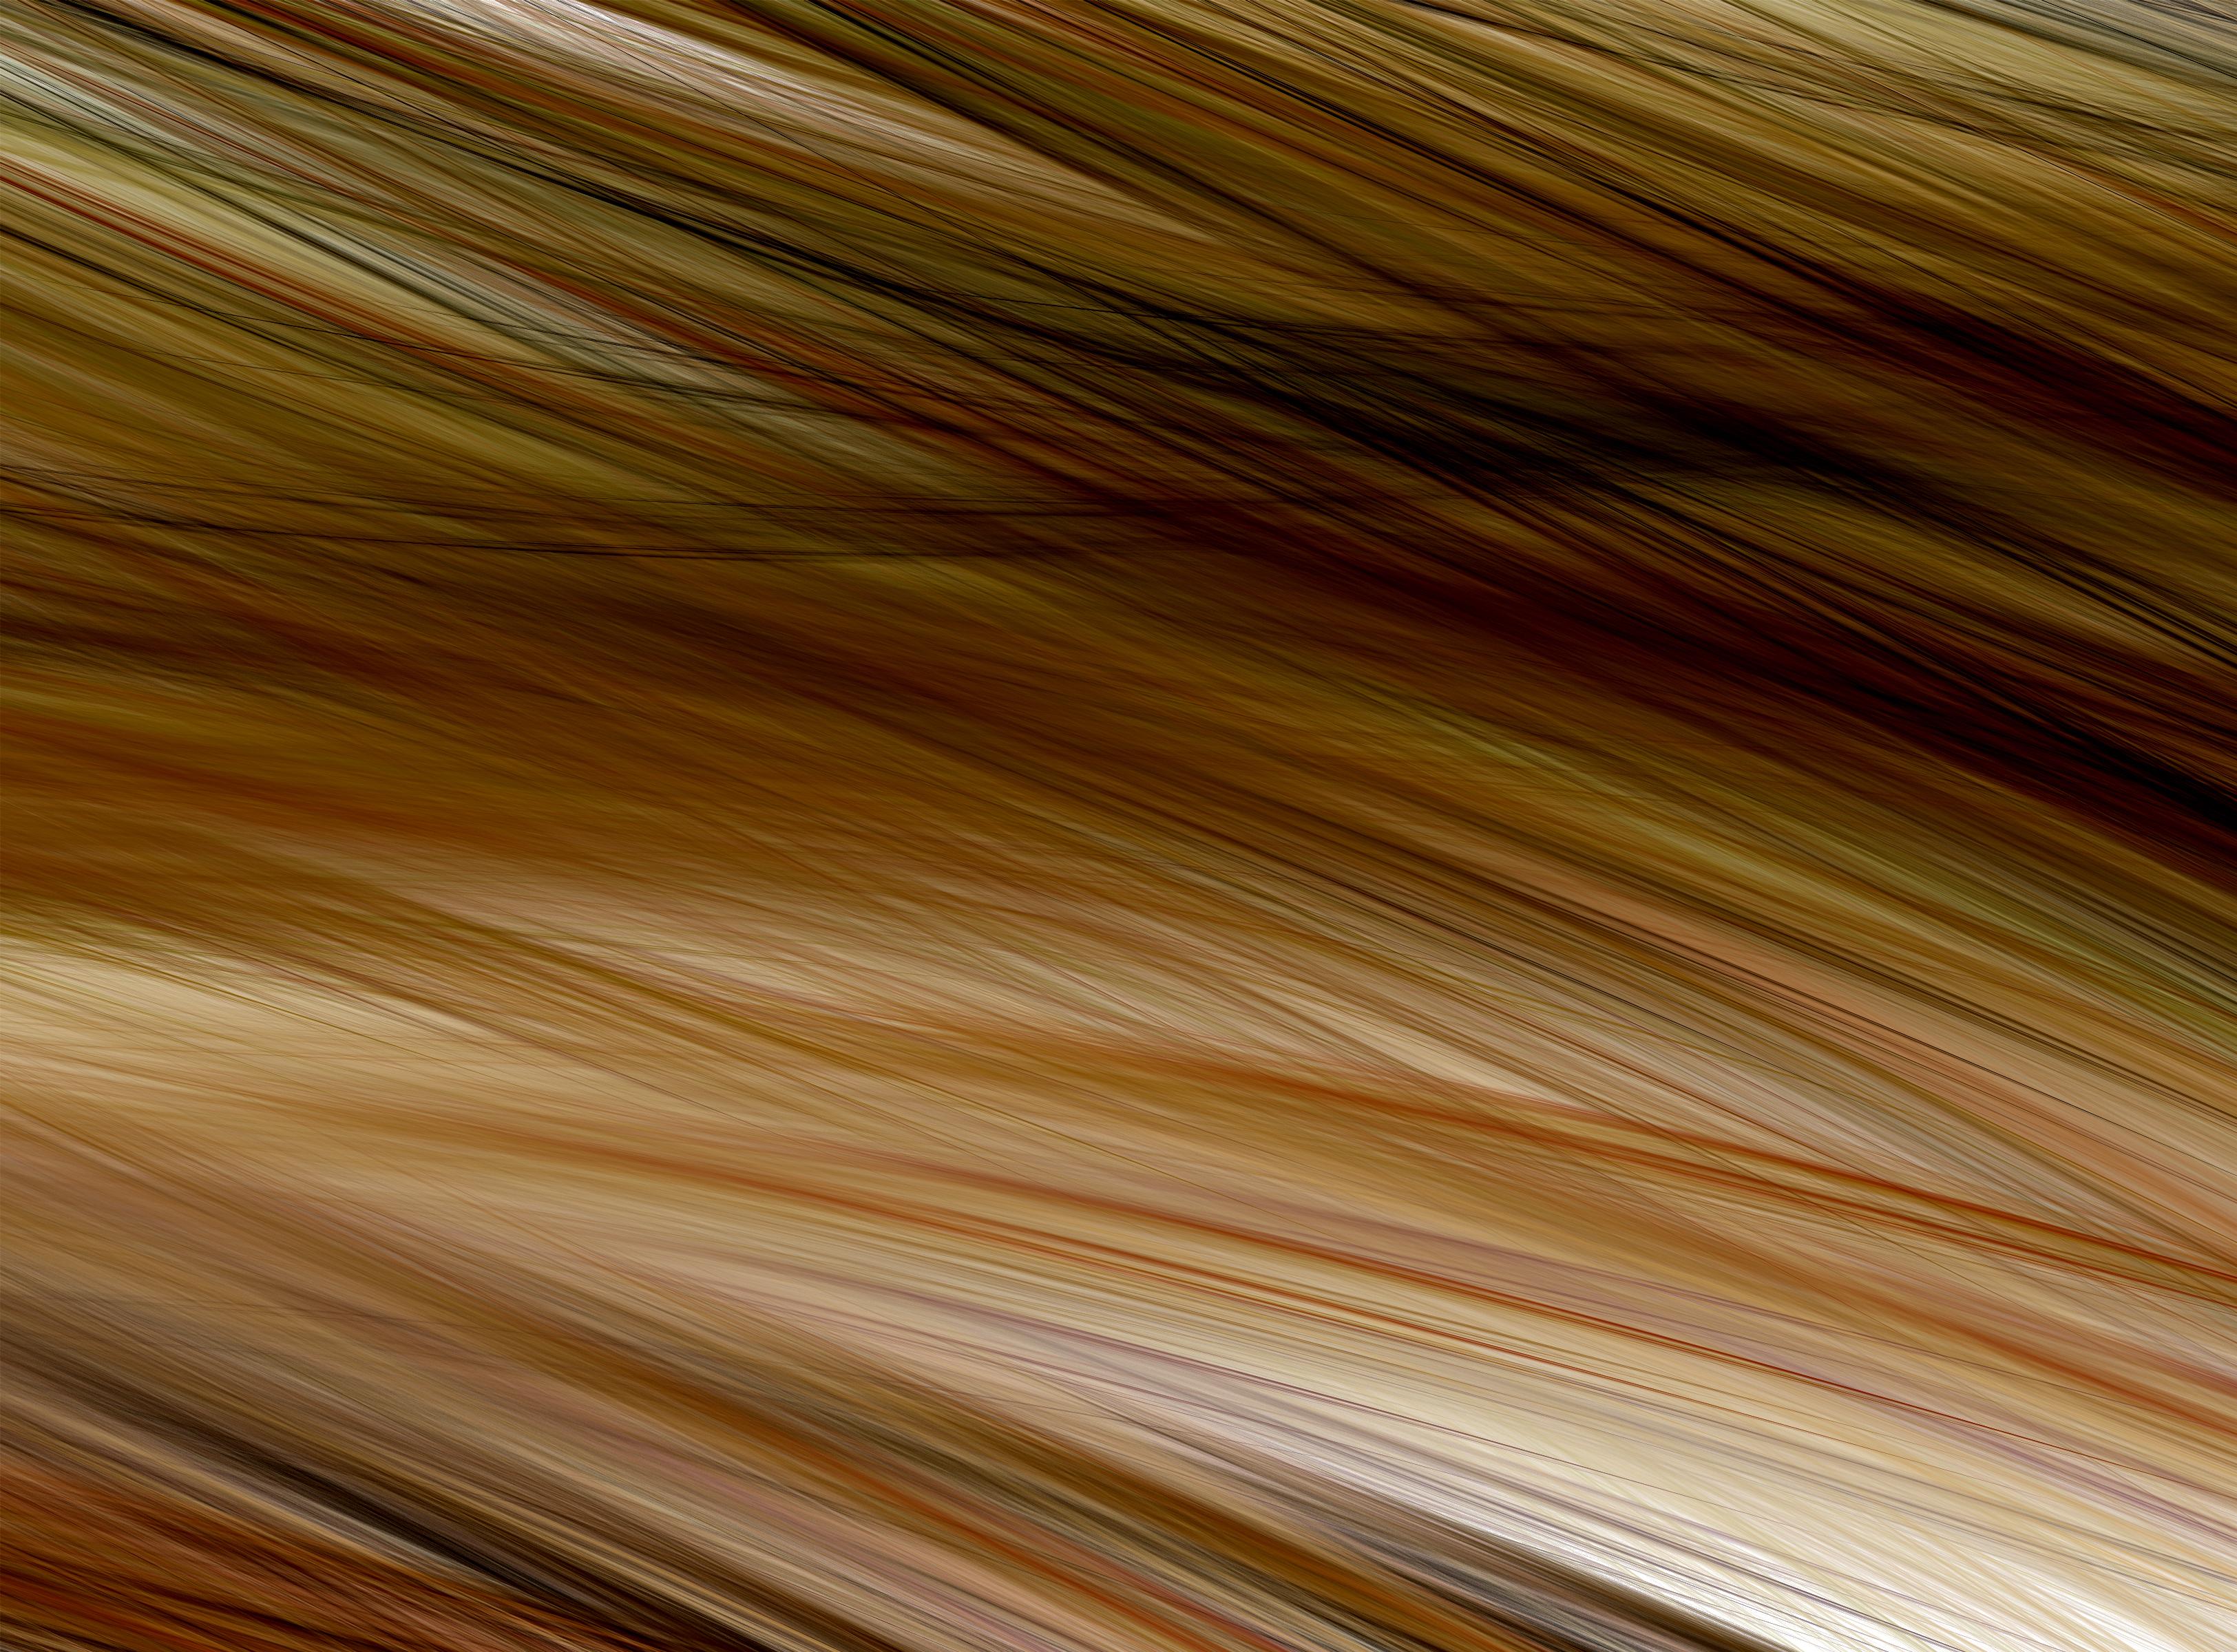 Line Texture : Line texture by paulinemoss on deviantart